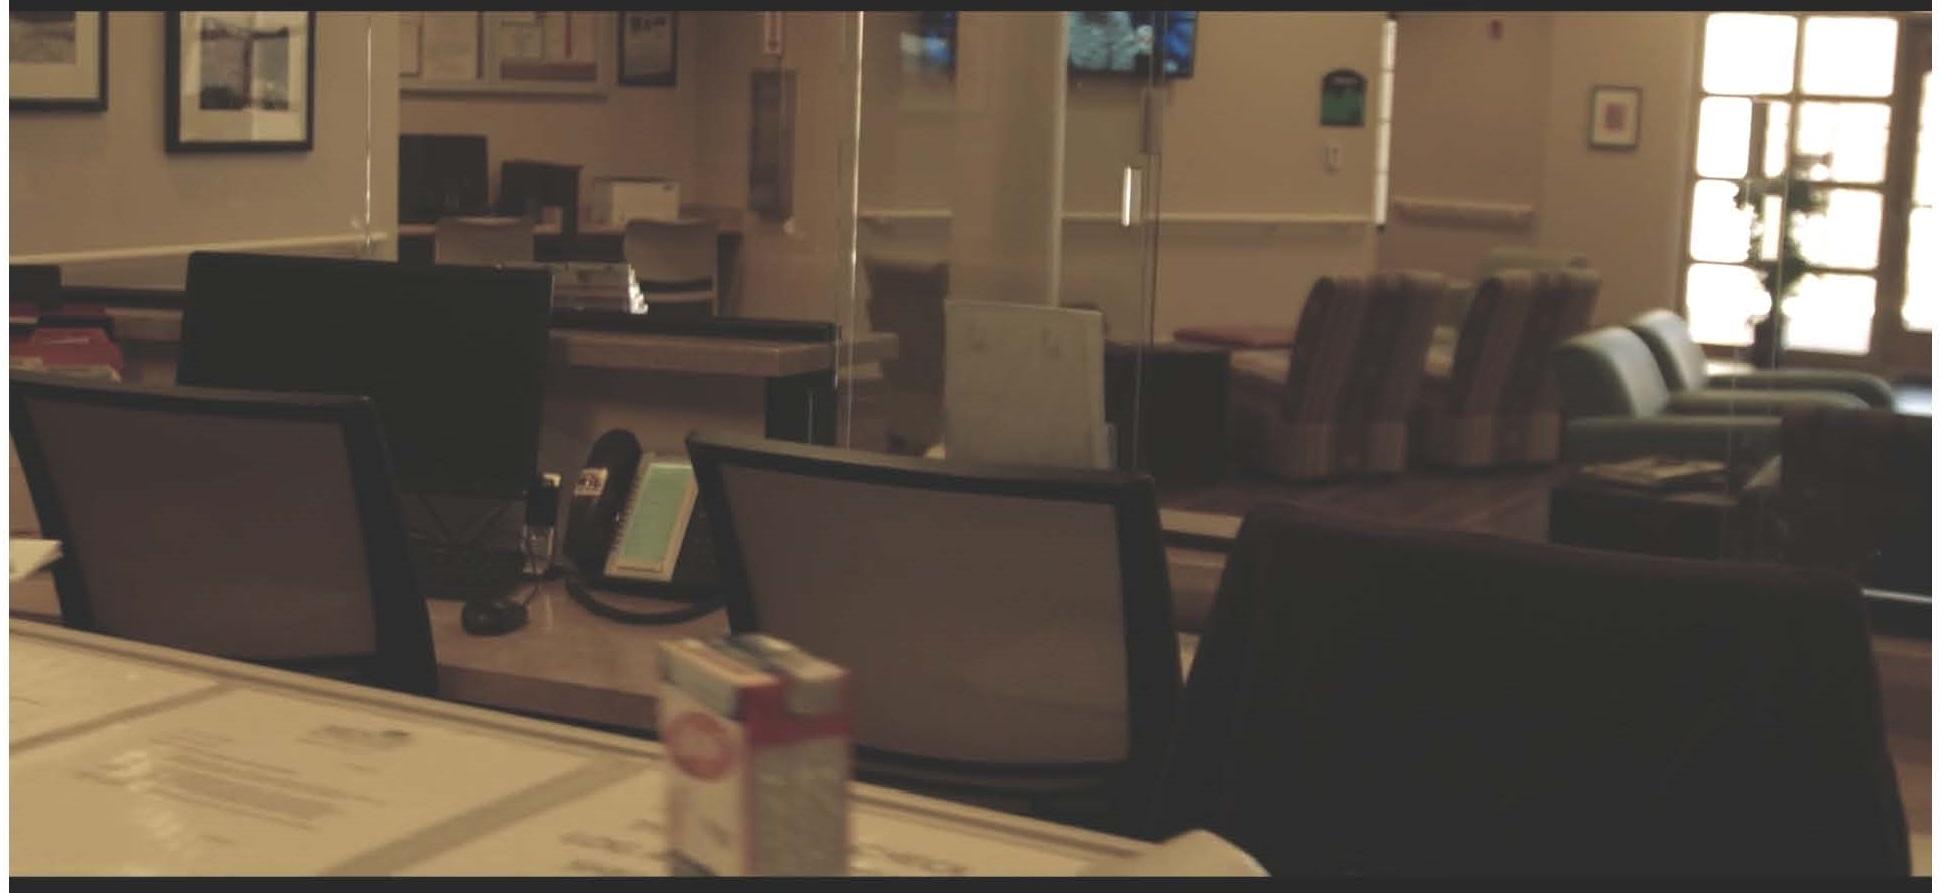 Mentis Neuro - El Paso Location Virtual Tour-HD on Vimeo13